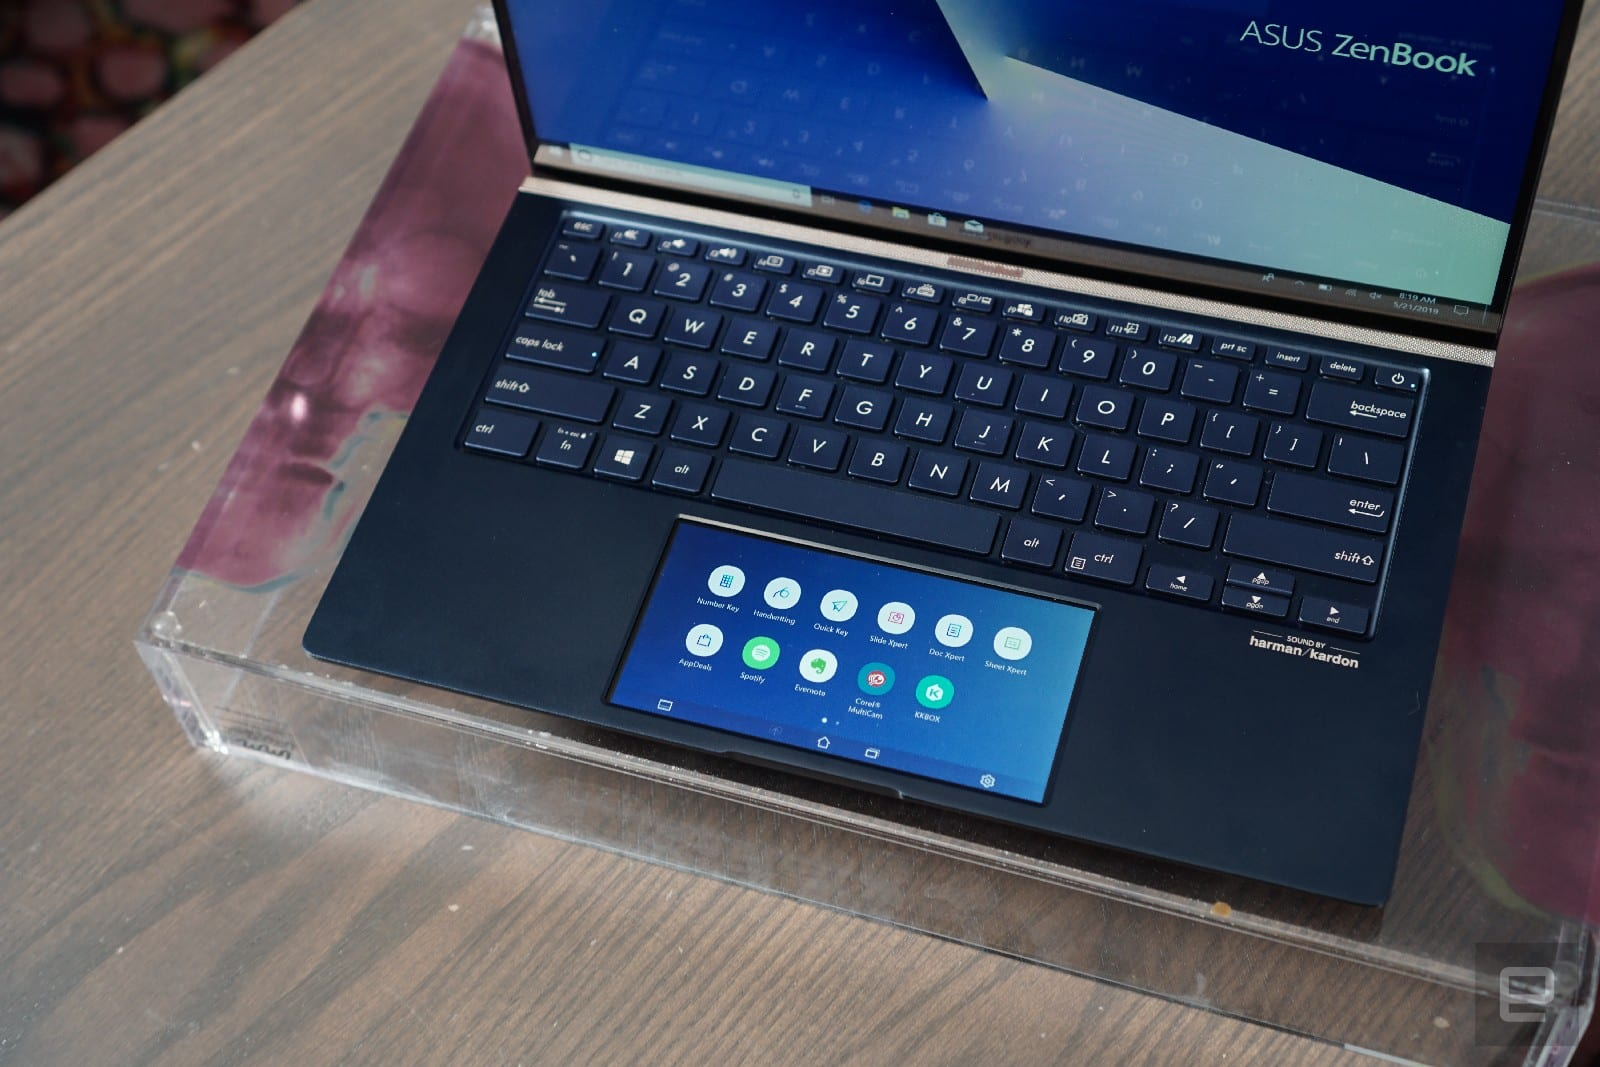 ASUS ScreenPad 2.0 touchscreen trackpad